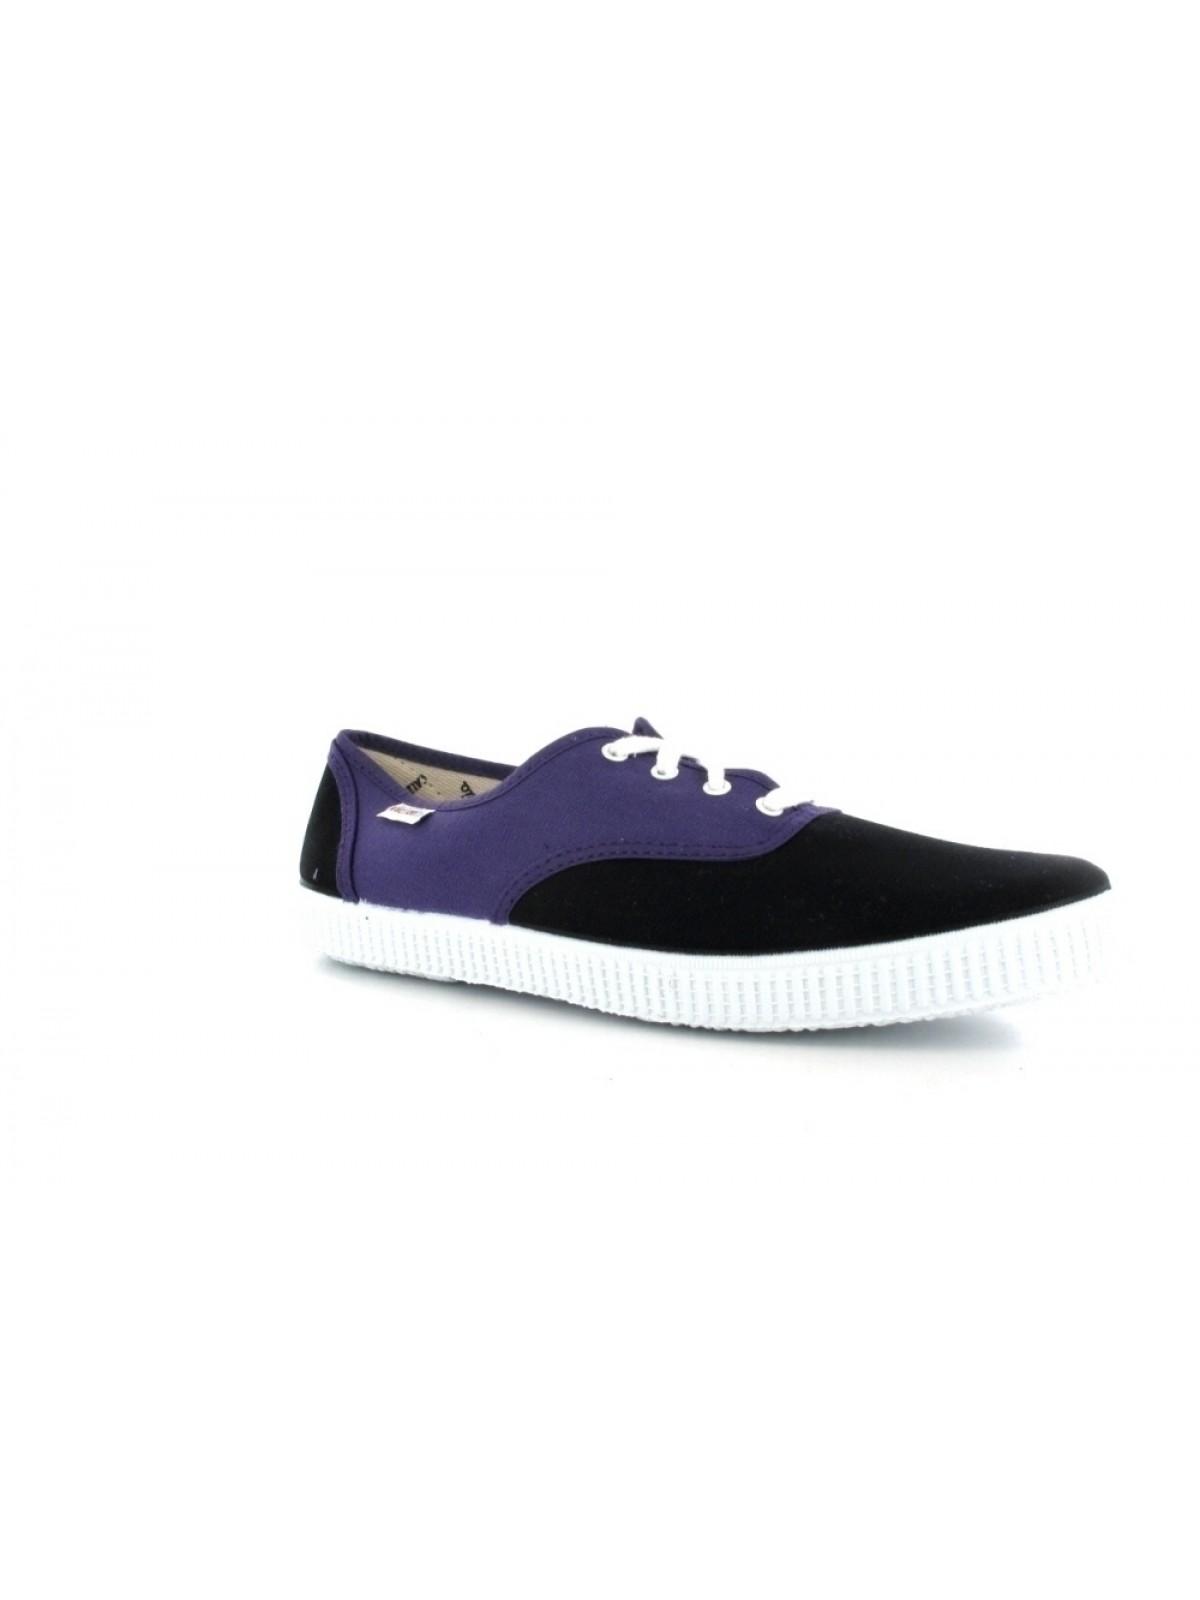 Victoria toile bicolore noir / violet